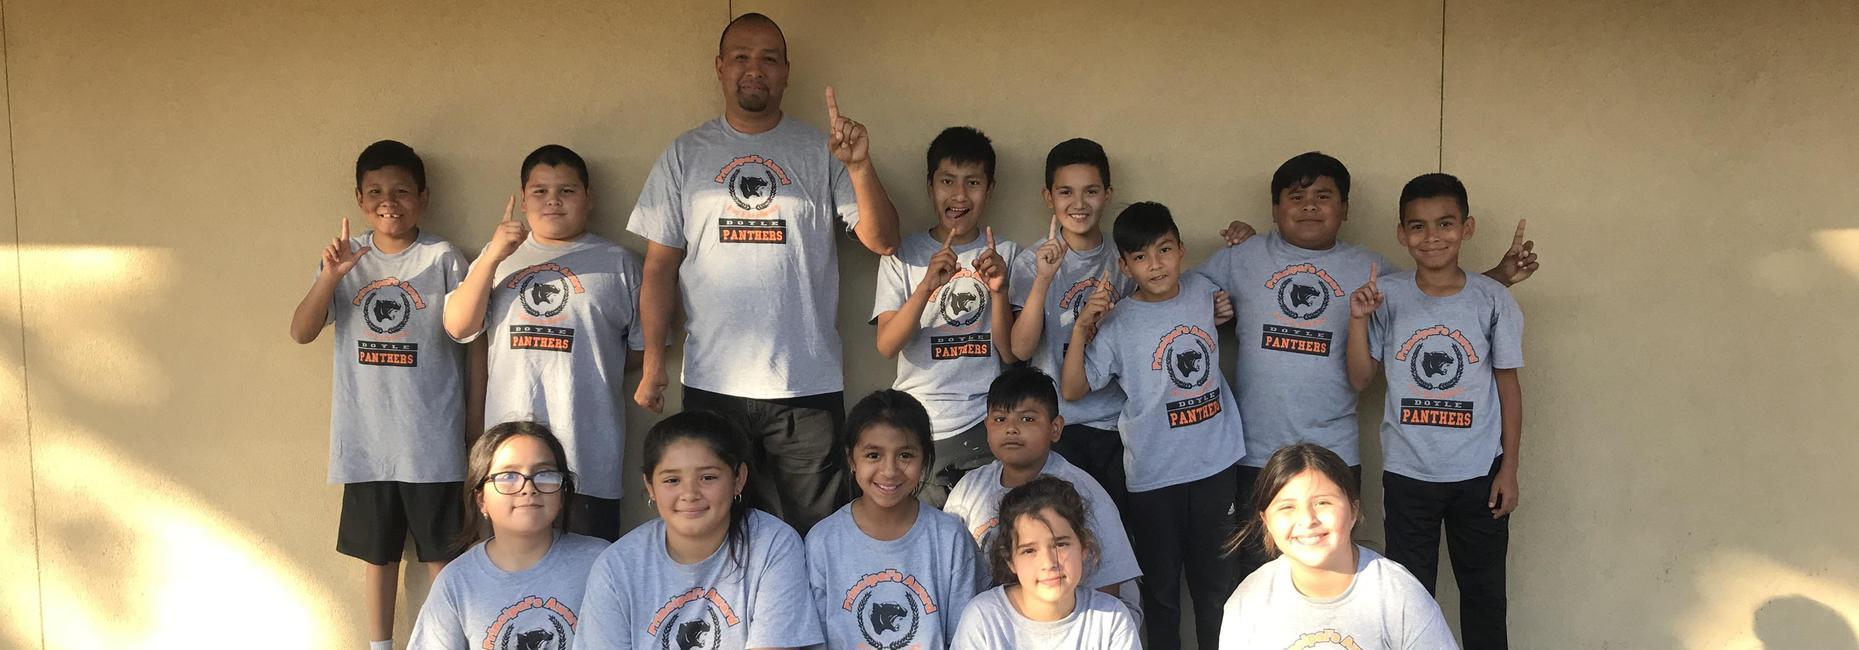 5th Grade Soccer Championship